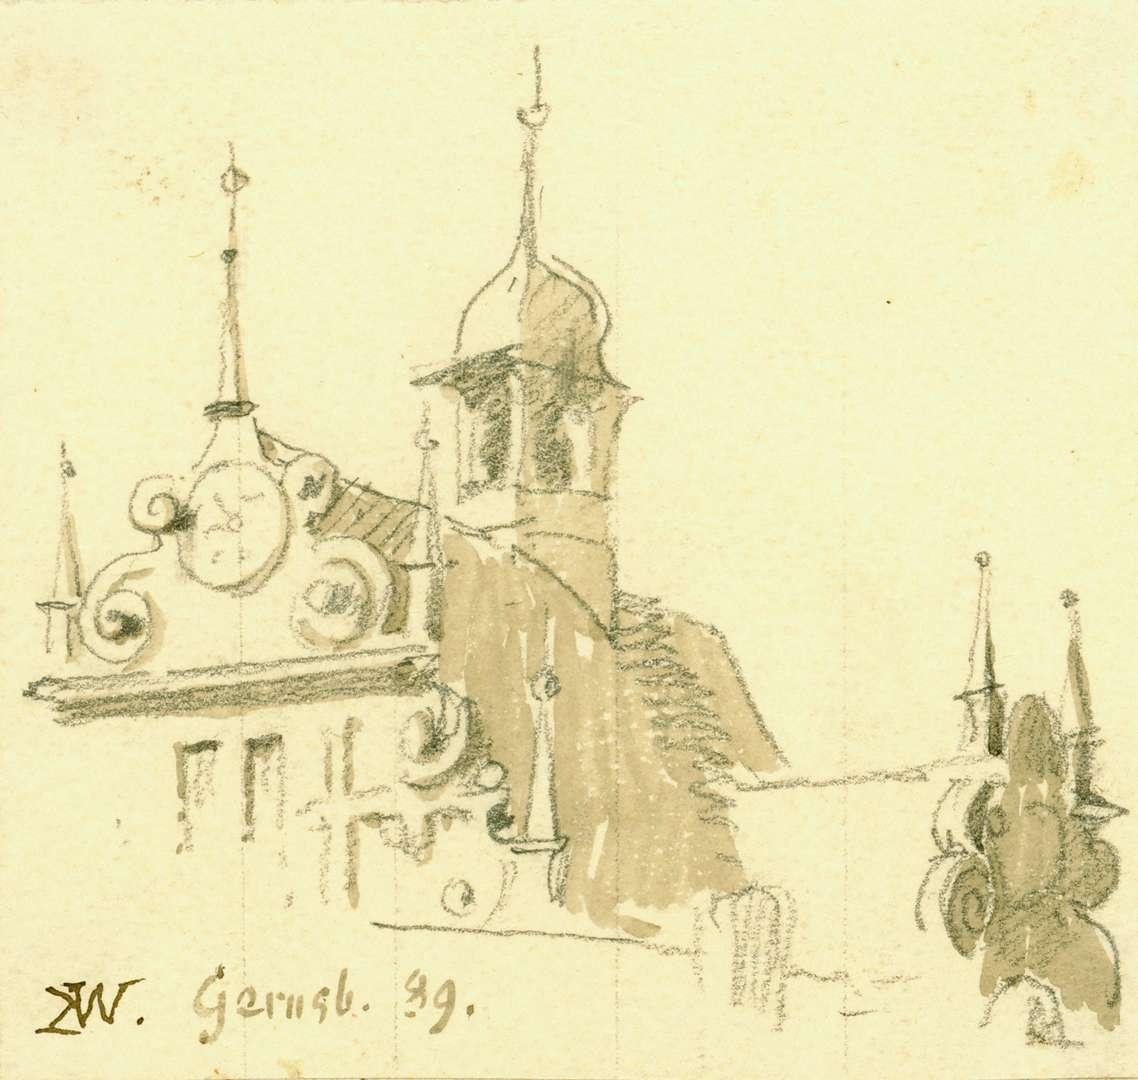 Gernsbach Giebelfassade Rathaus, Bild 1